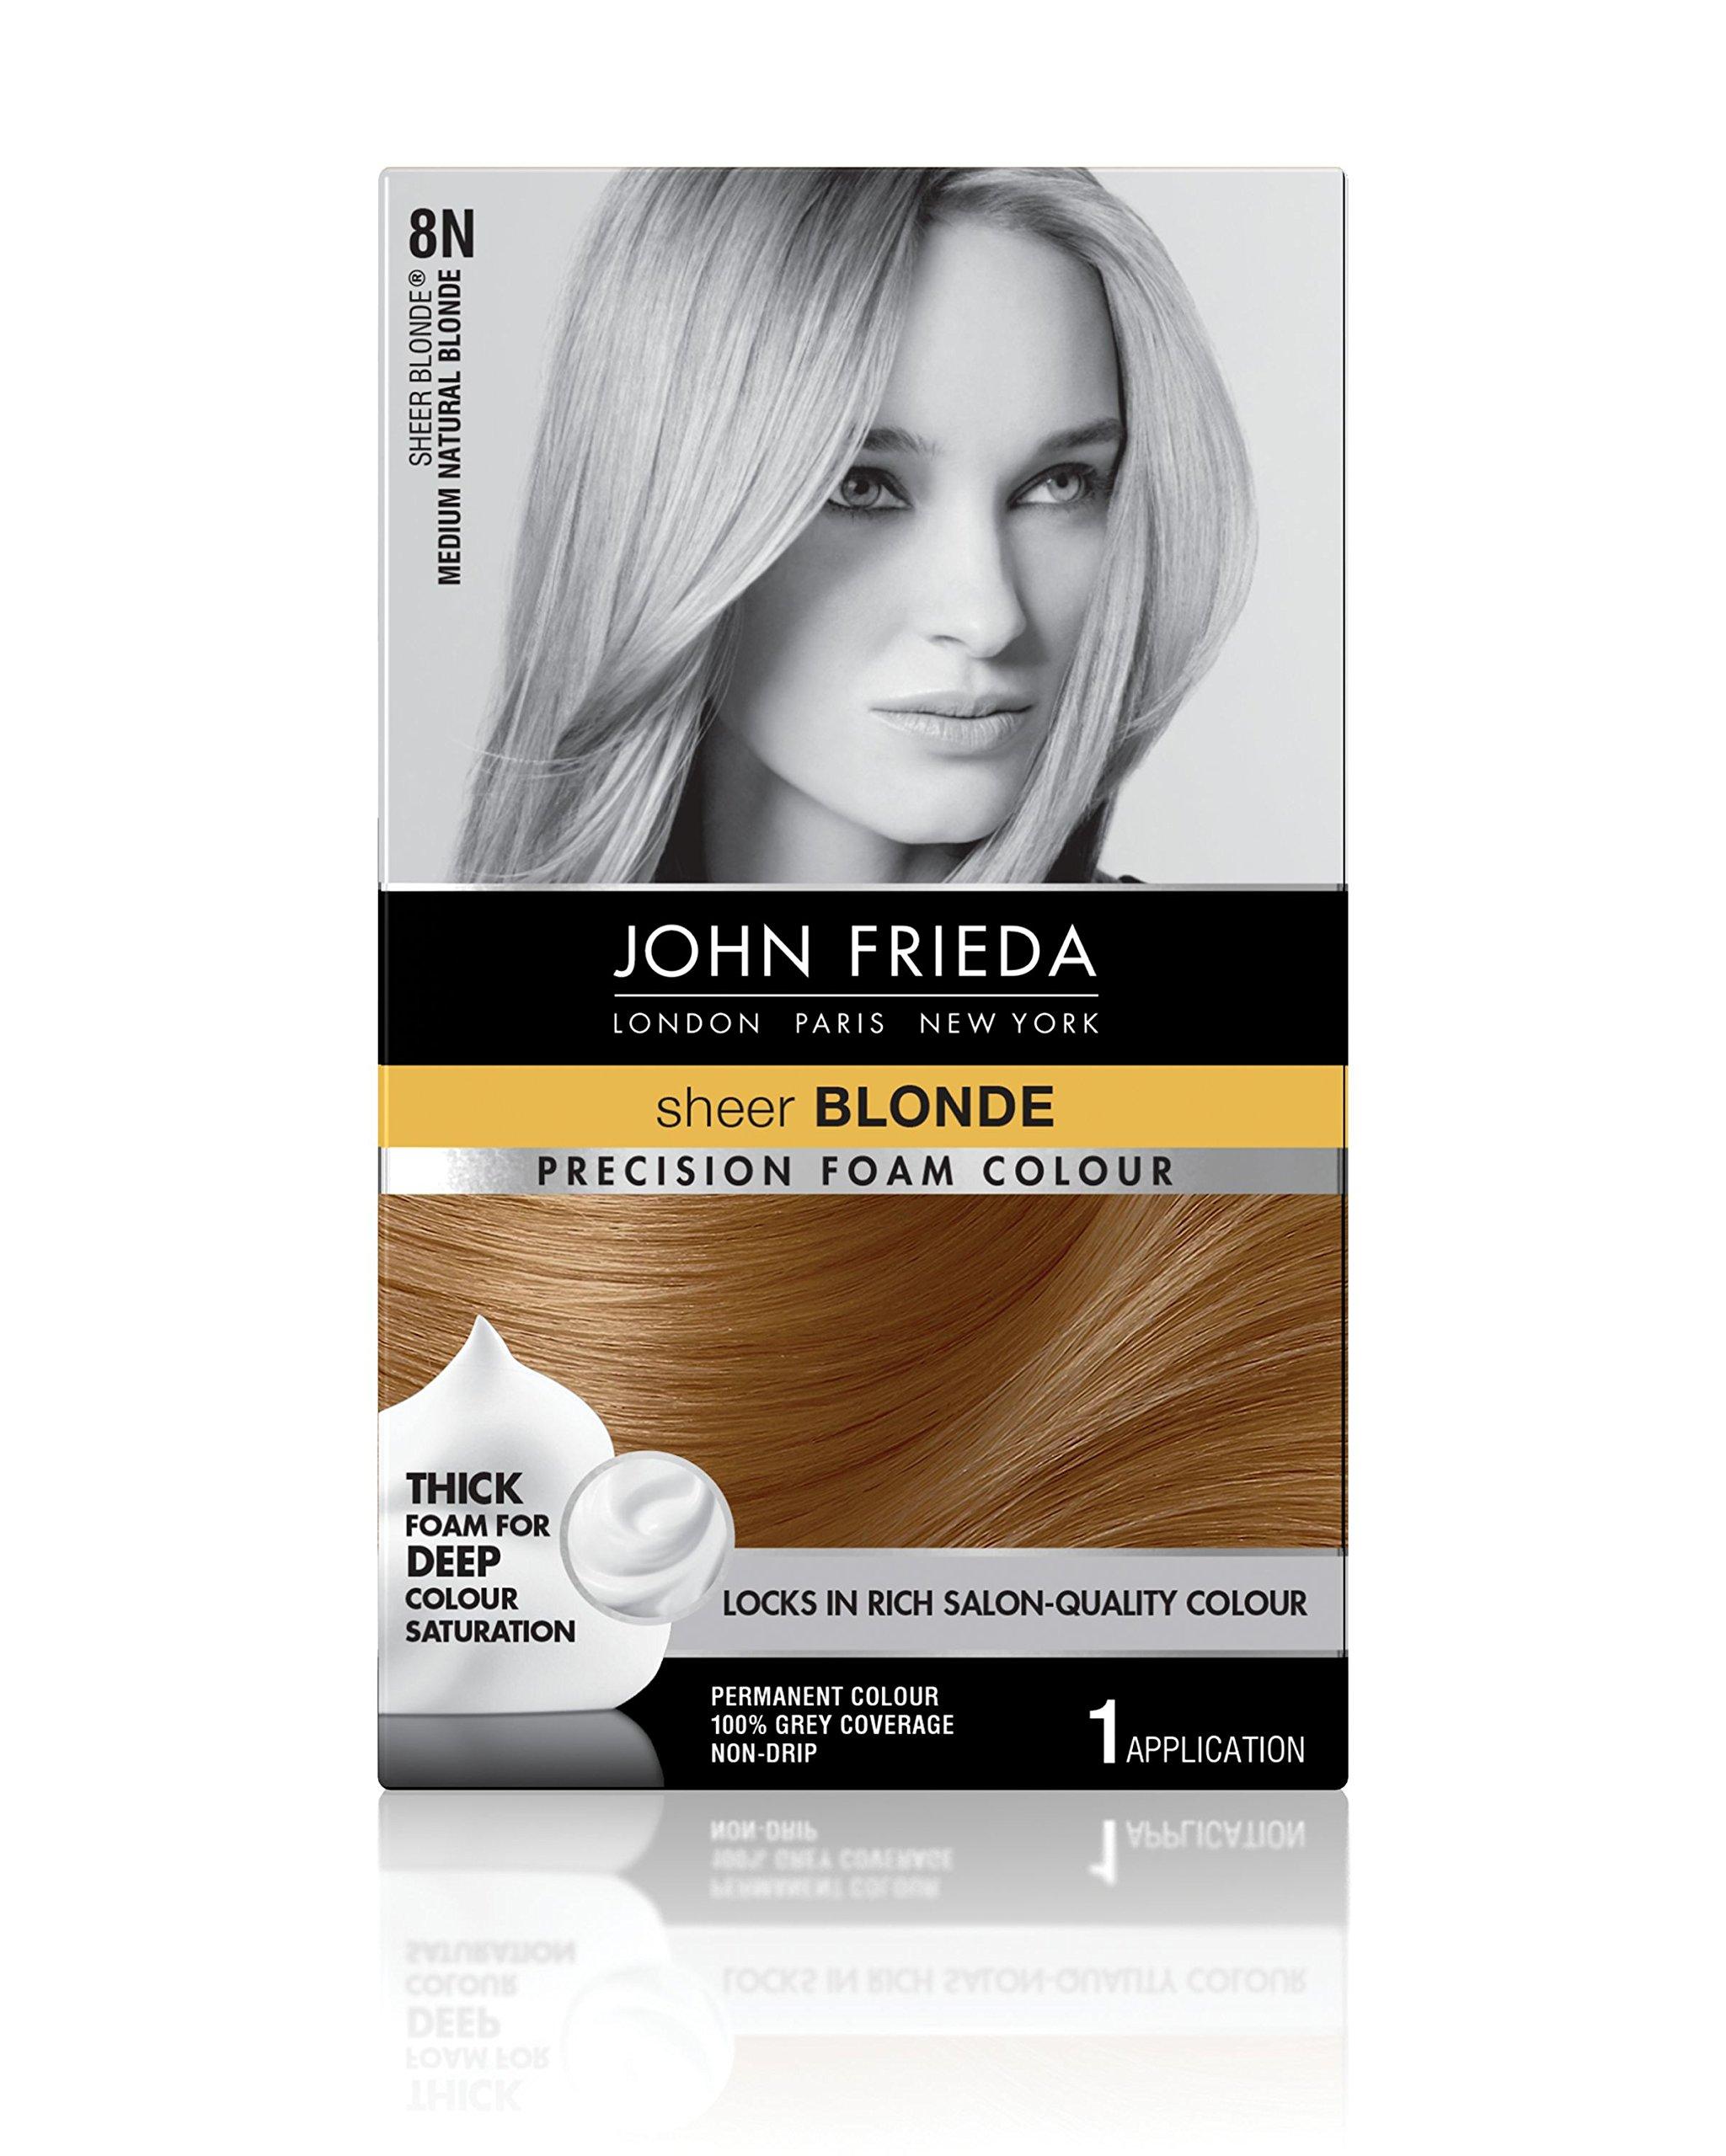 John Frieda Precision Foam Colour, Medium Natural Blonde 8N by John Frieda